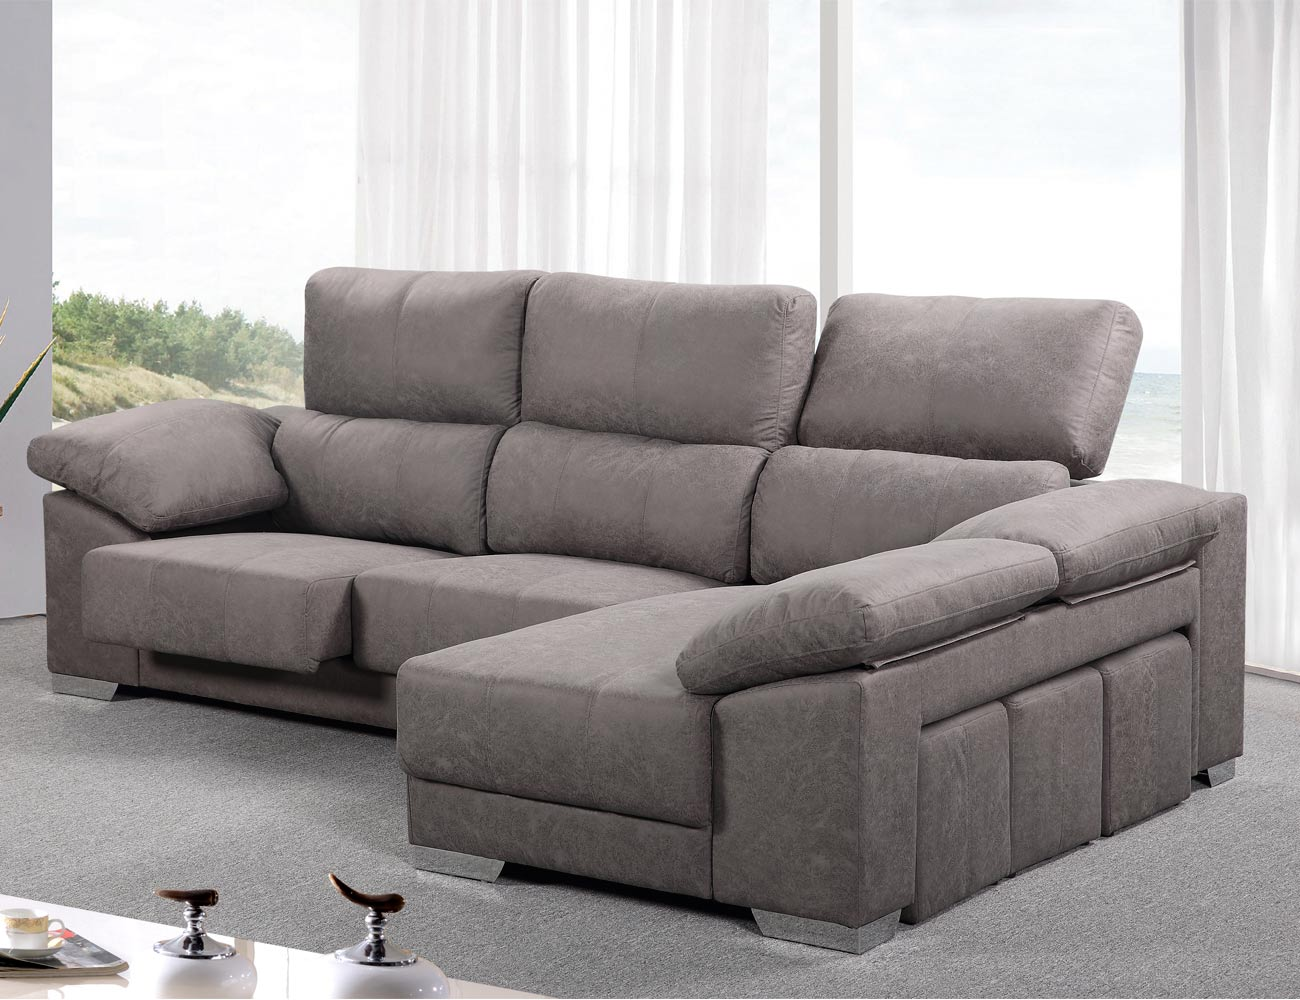 Sof chaiselongue reversible con asientos extra bles y - Cabezales de tela ...